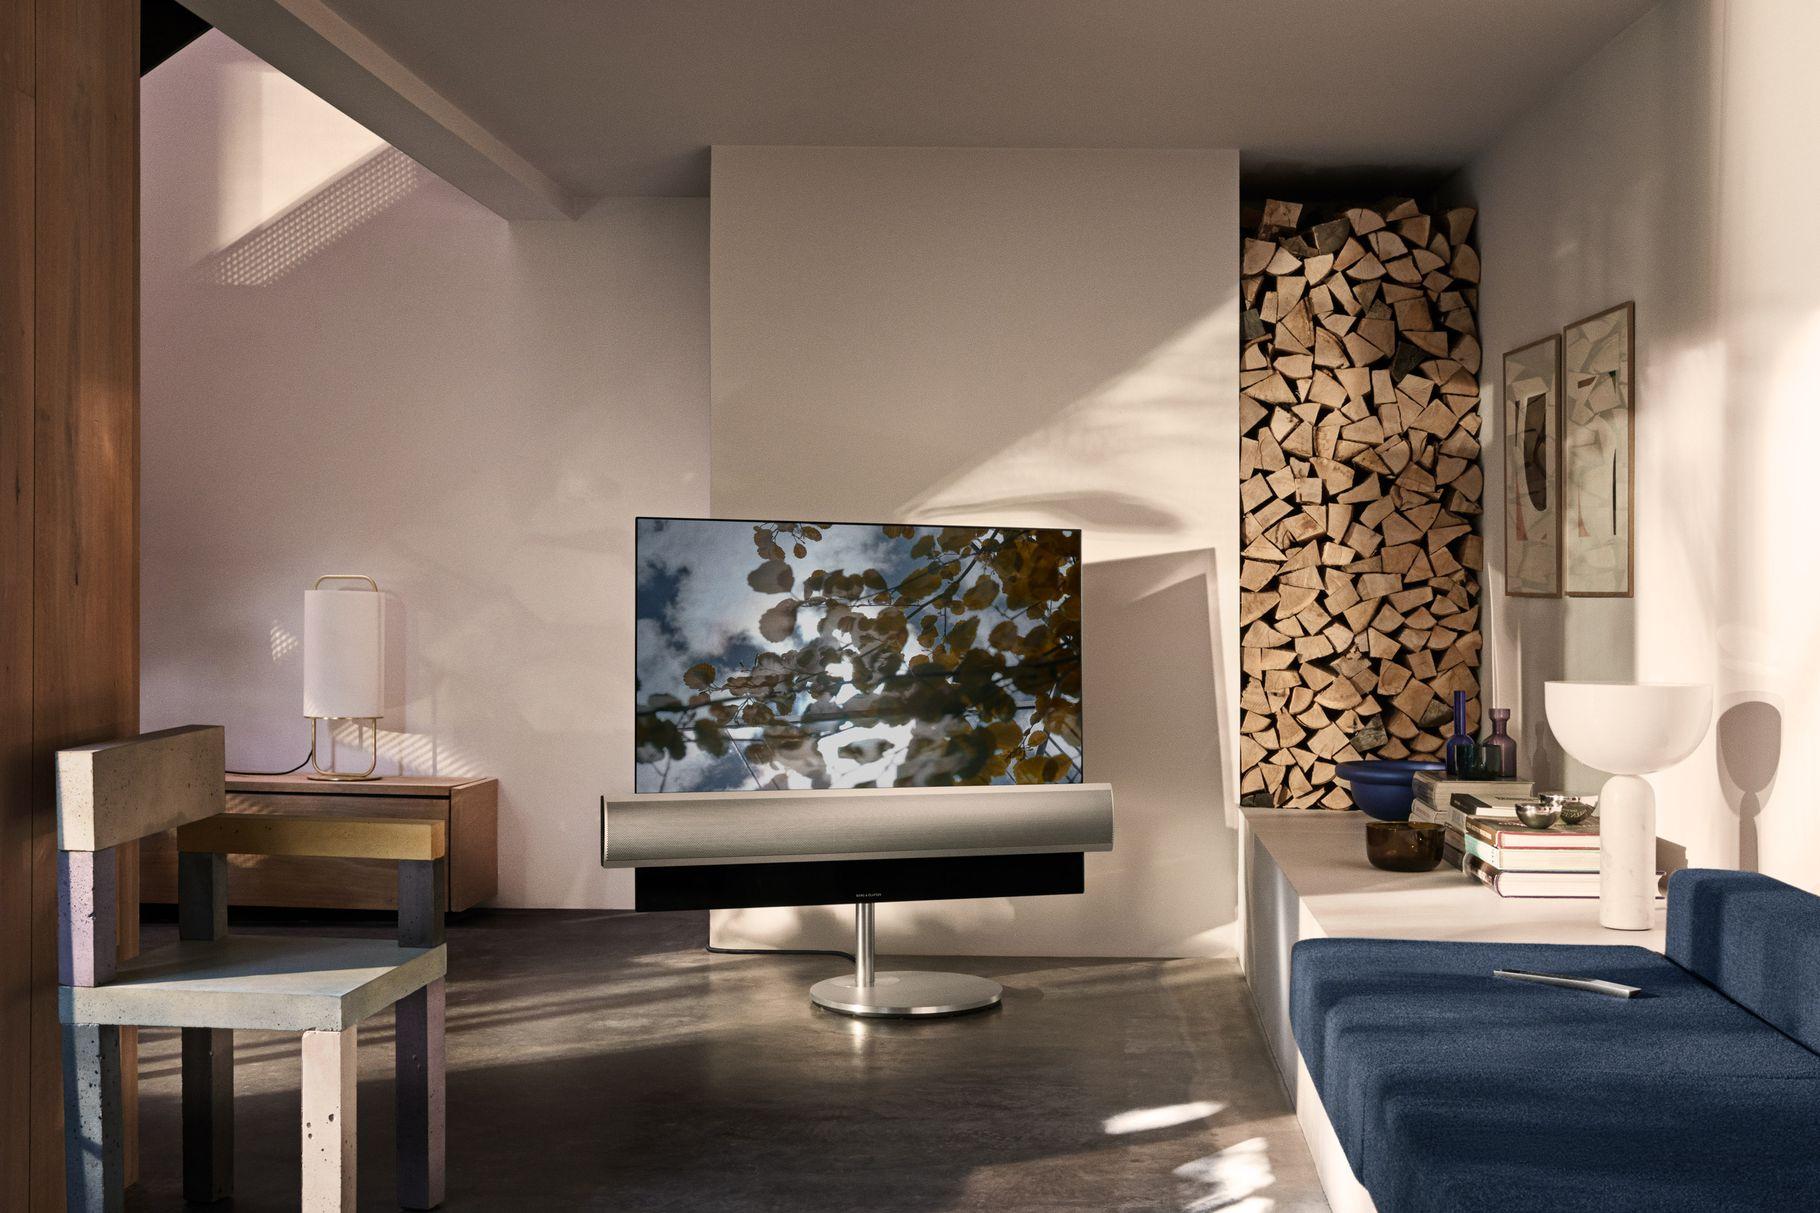 Freemium:  La tele más sublime del momento se pasea por IFA